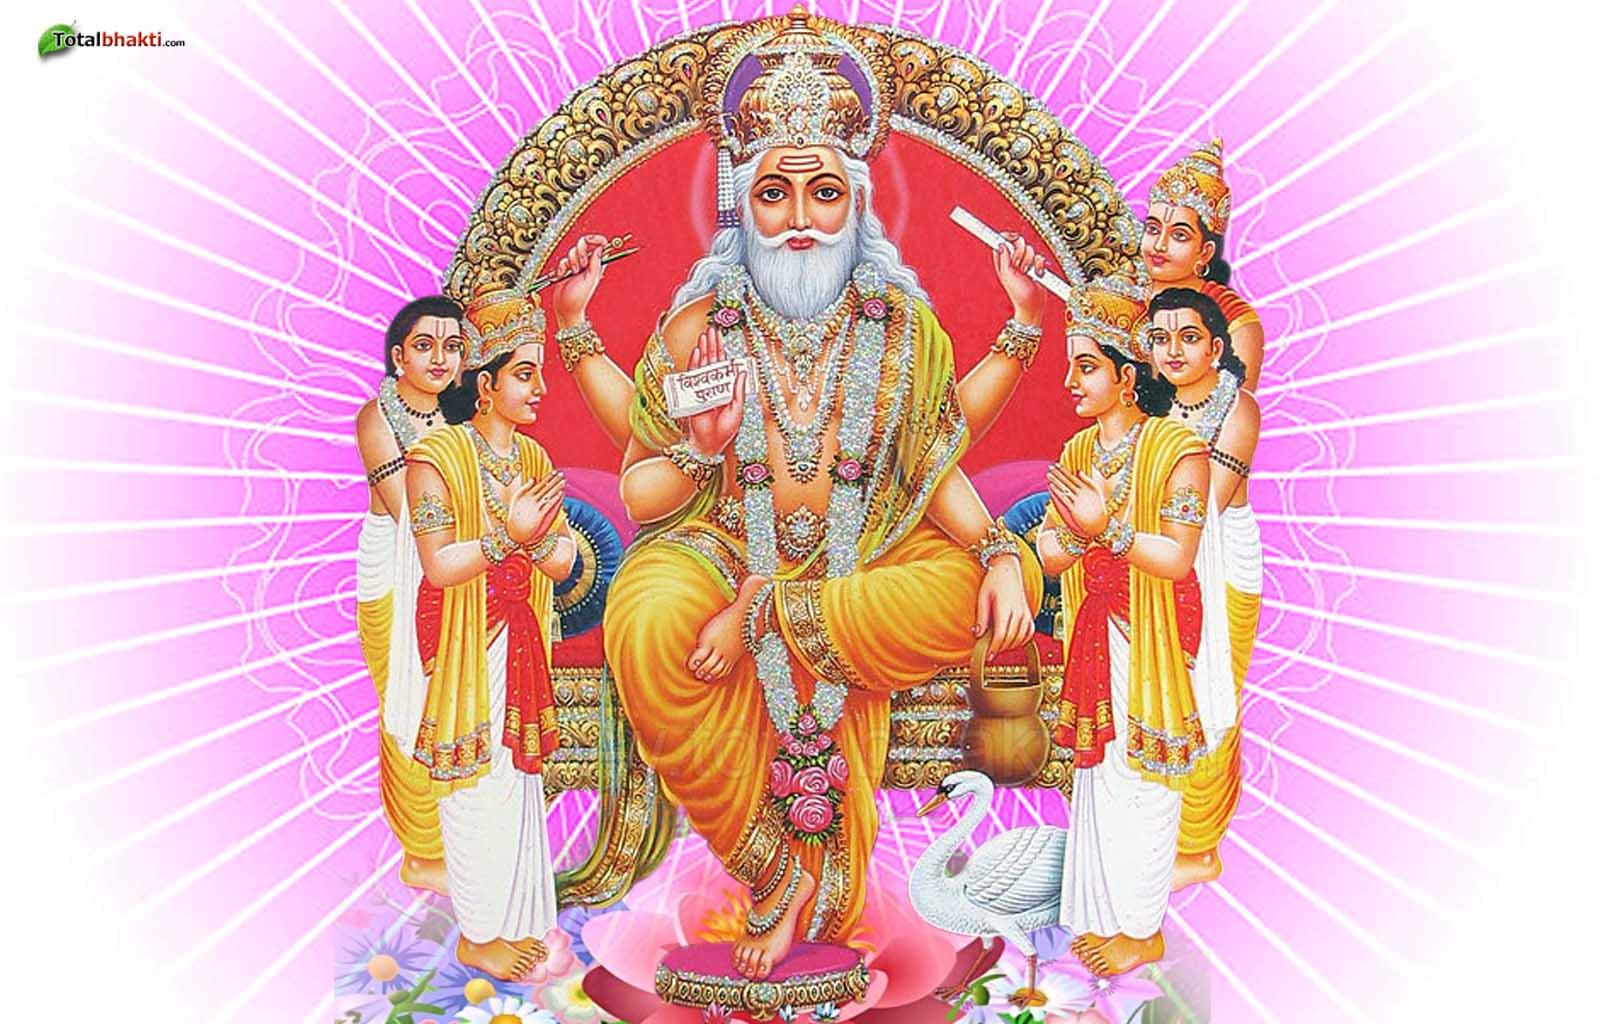 Vishwakarma Puja Aarti Shree Vishwakarma ji ki Aarti